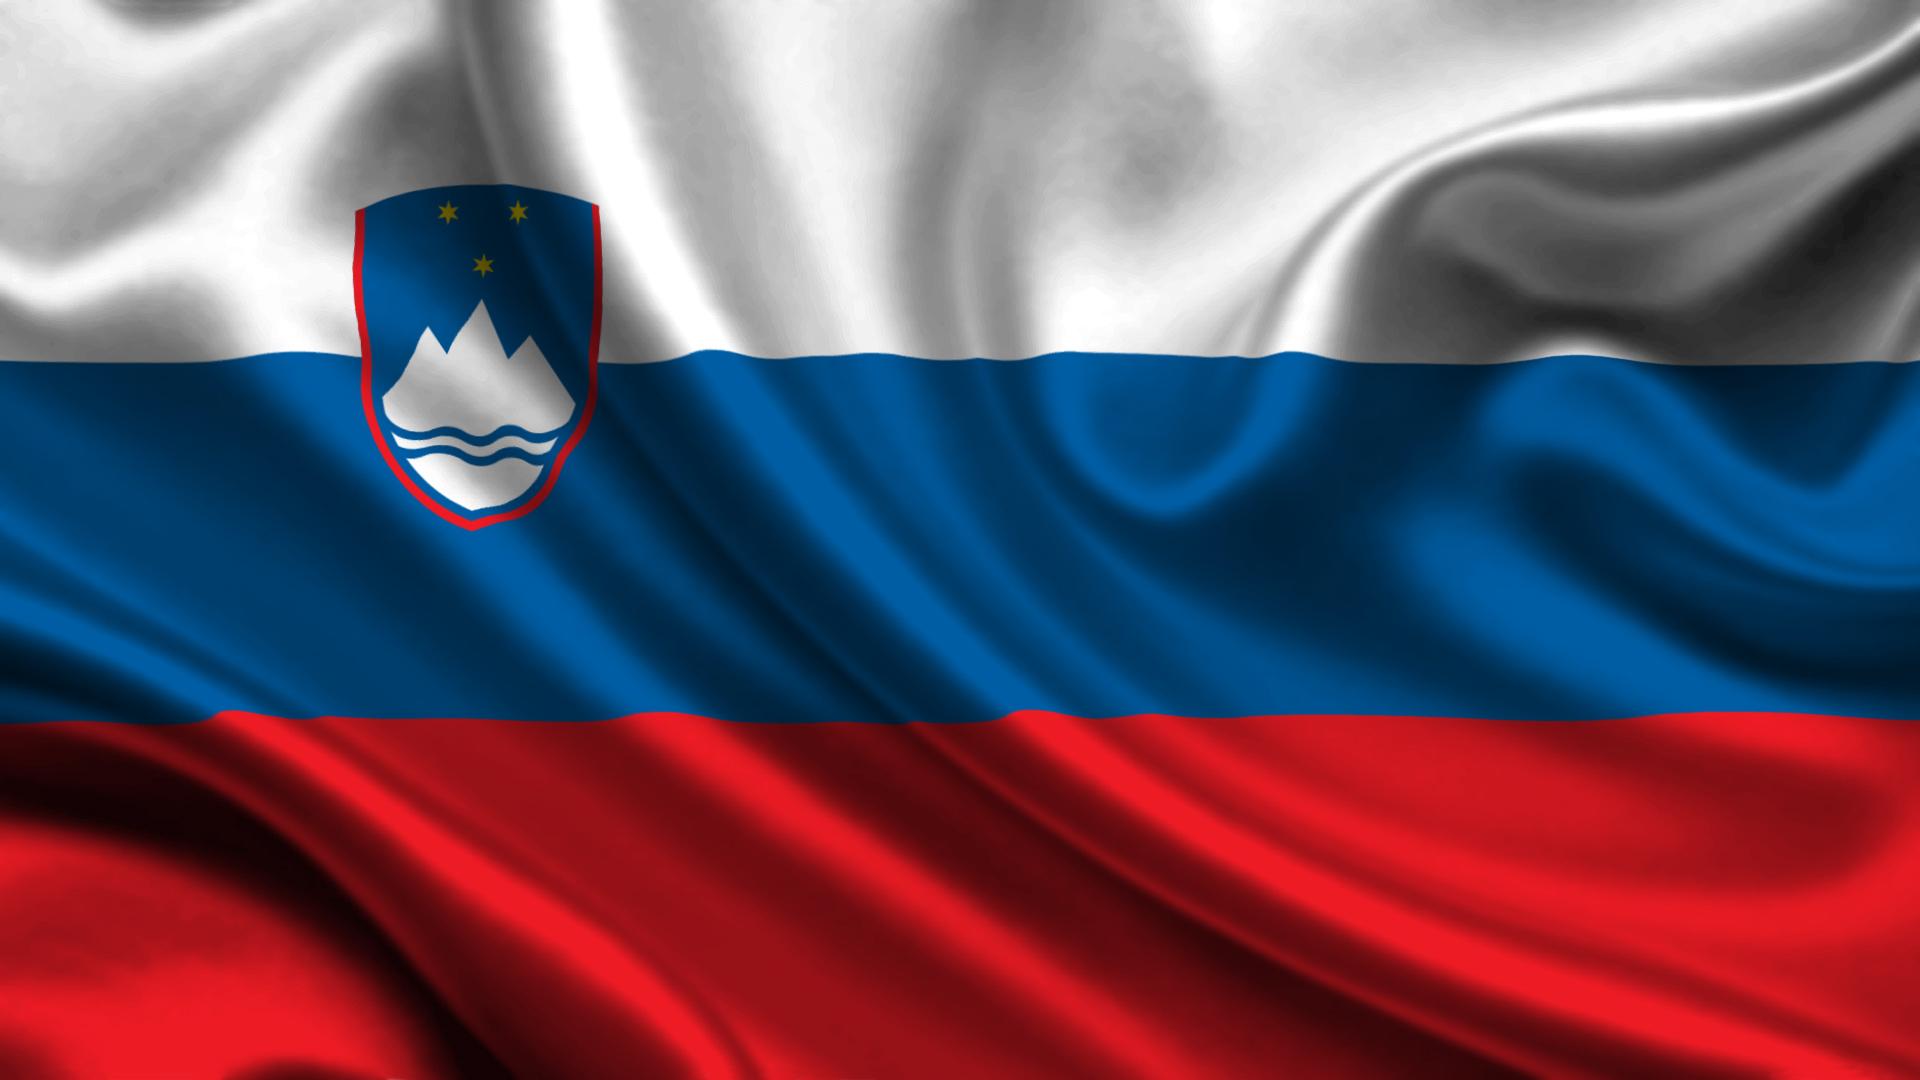 флаг-2